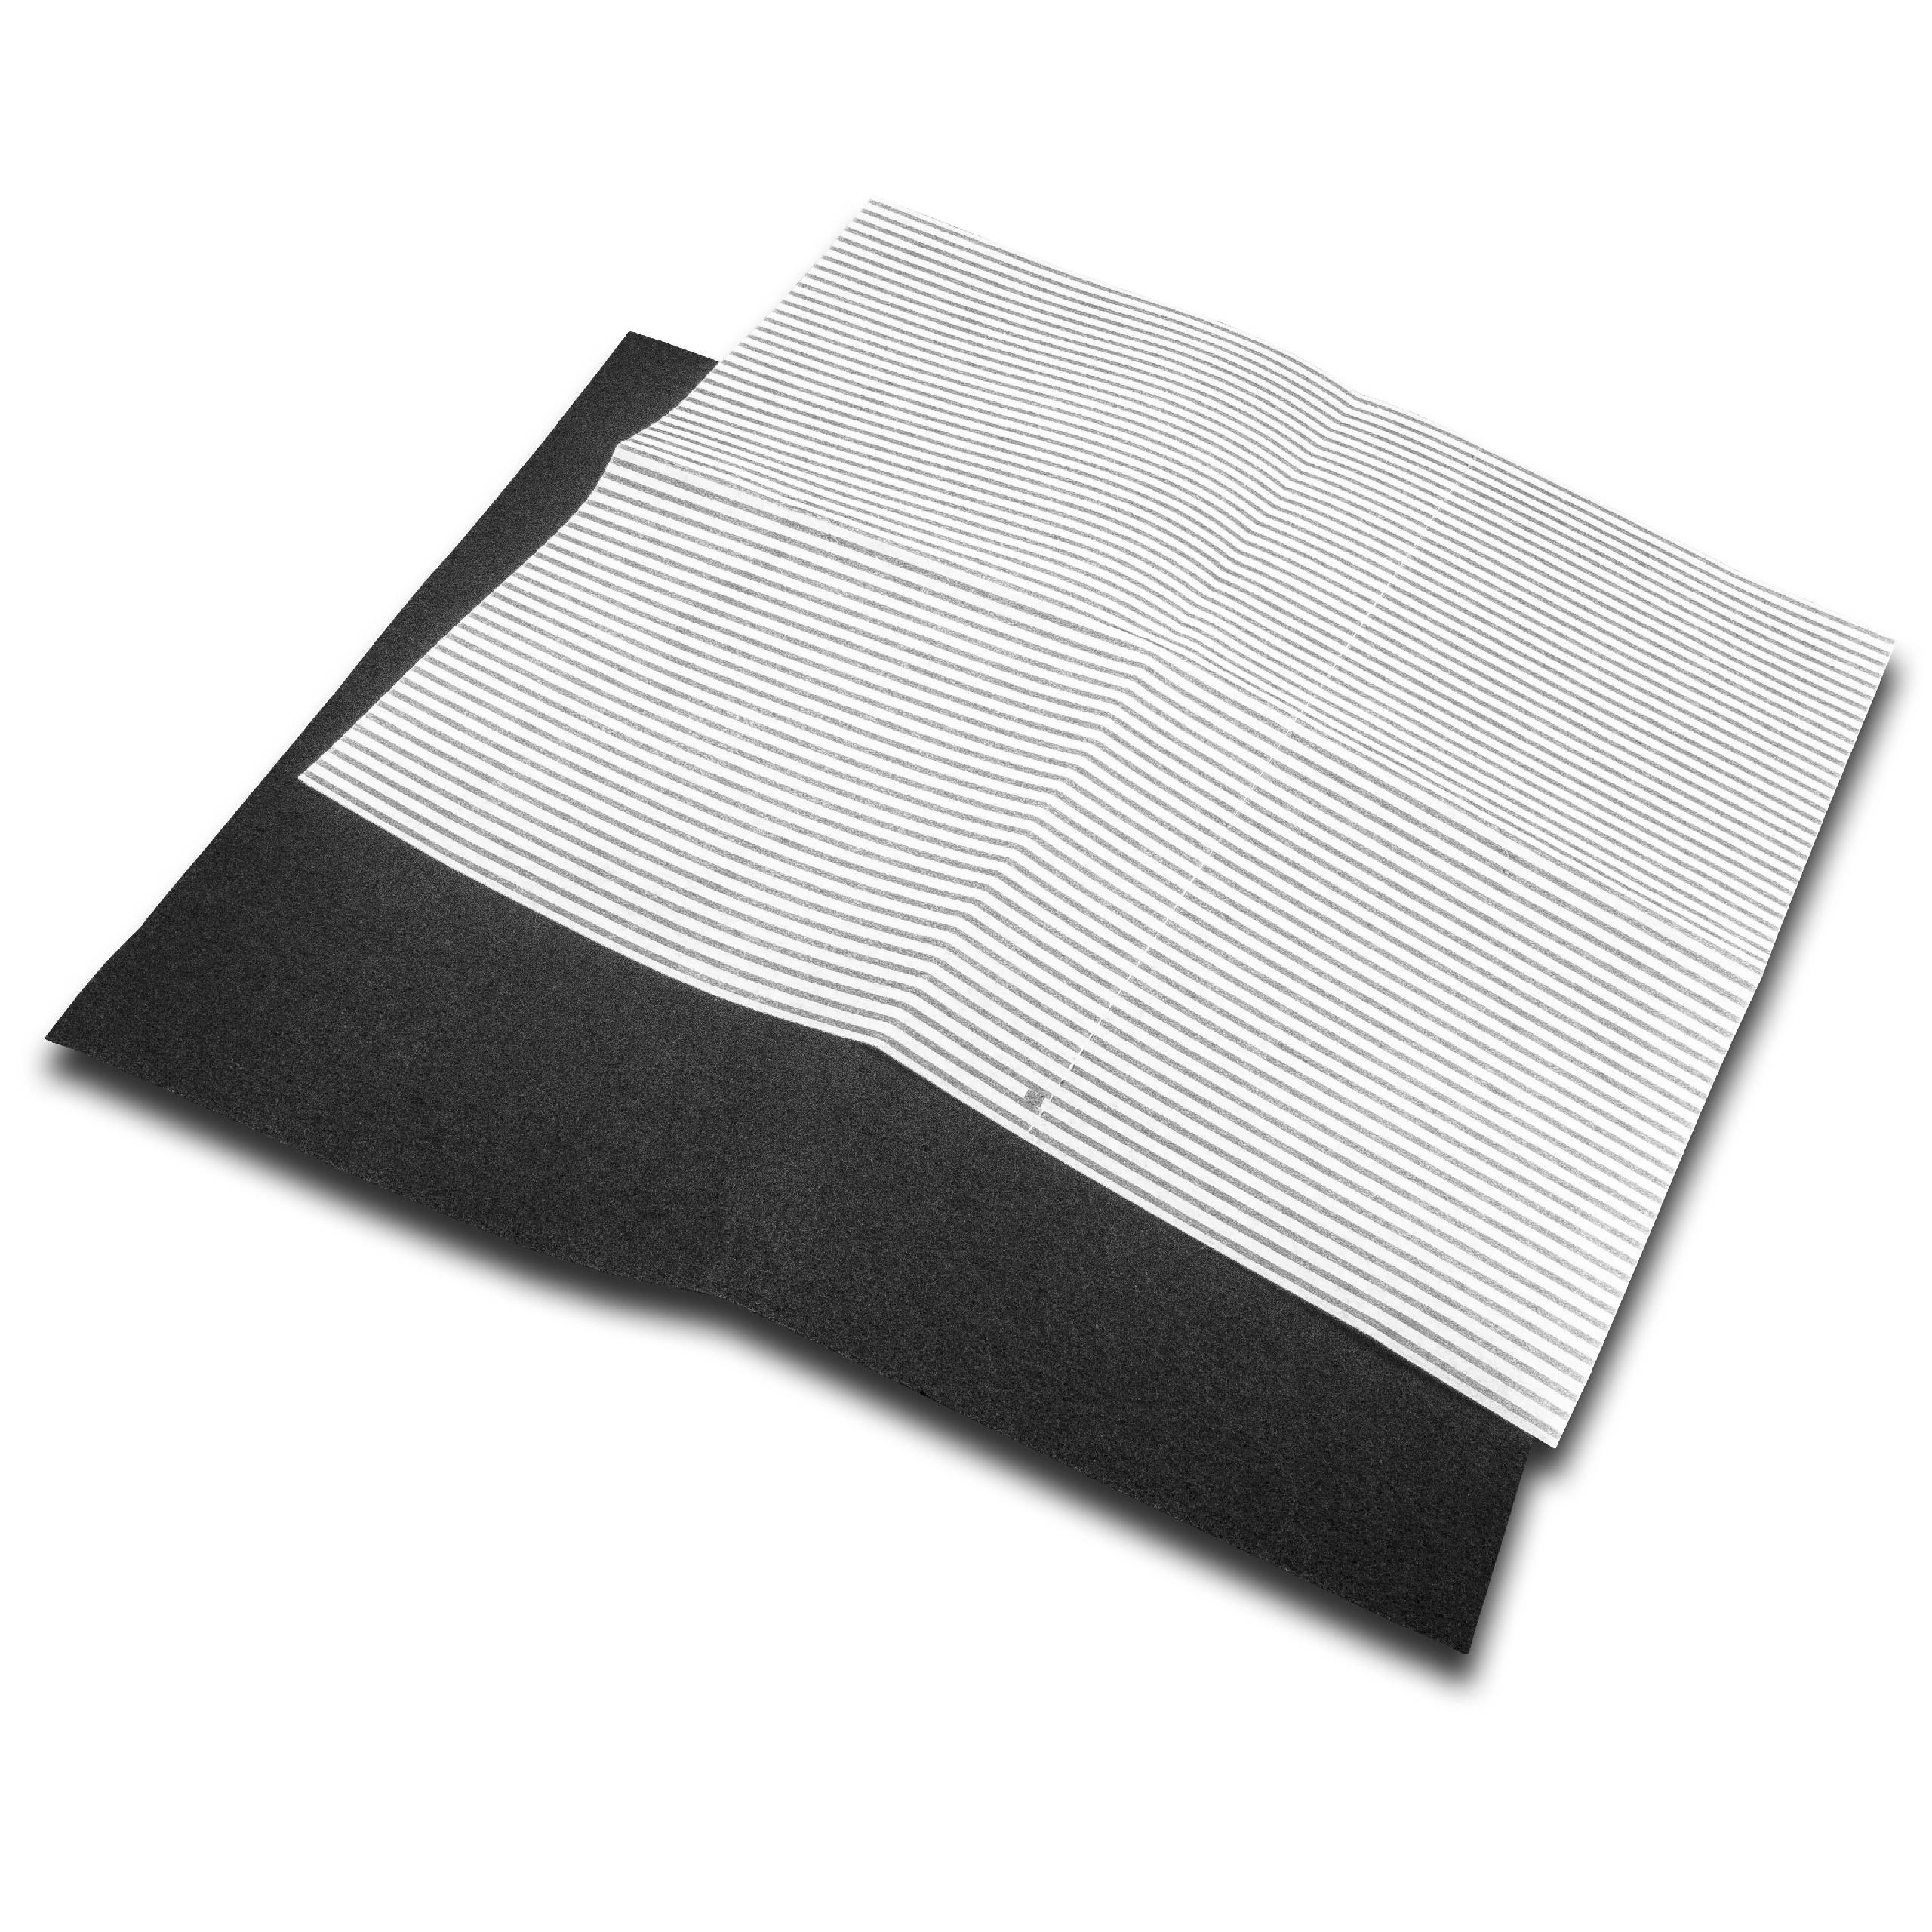 Vlies Dunstfilter fŸr Dunstabzugshauben mit 60cm fŸr Franke Whirlpool Smeg